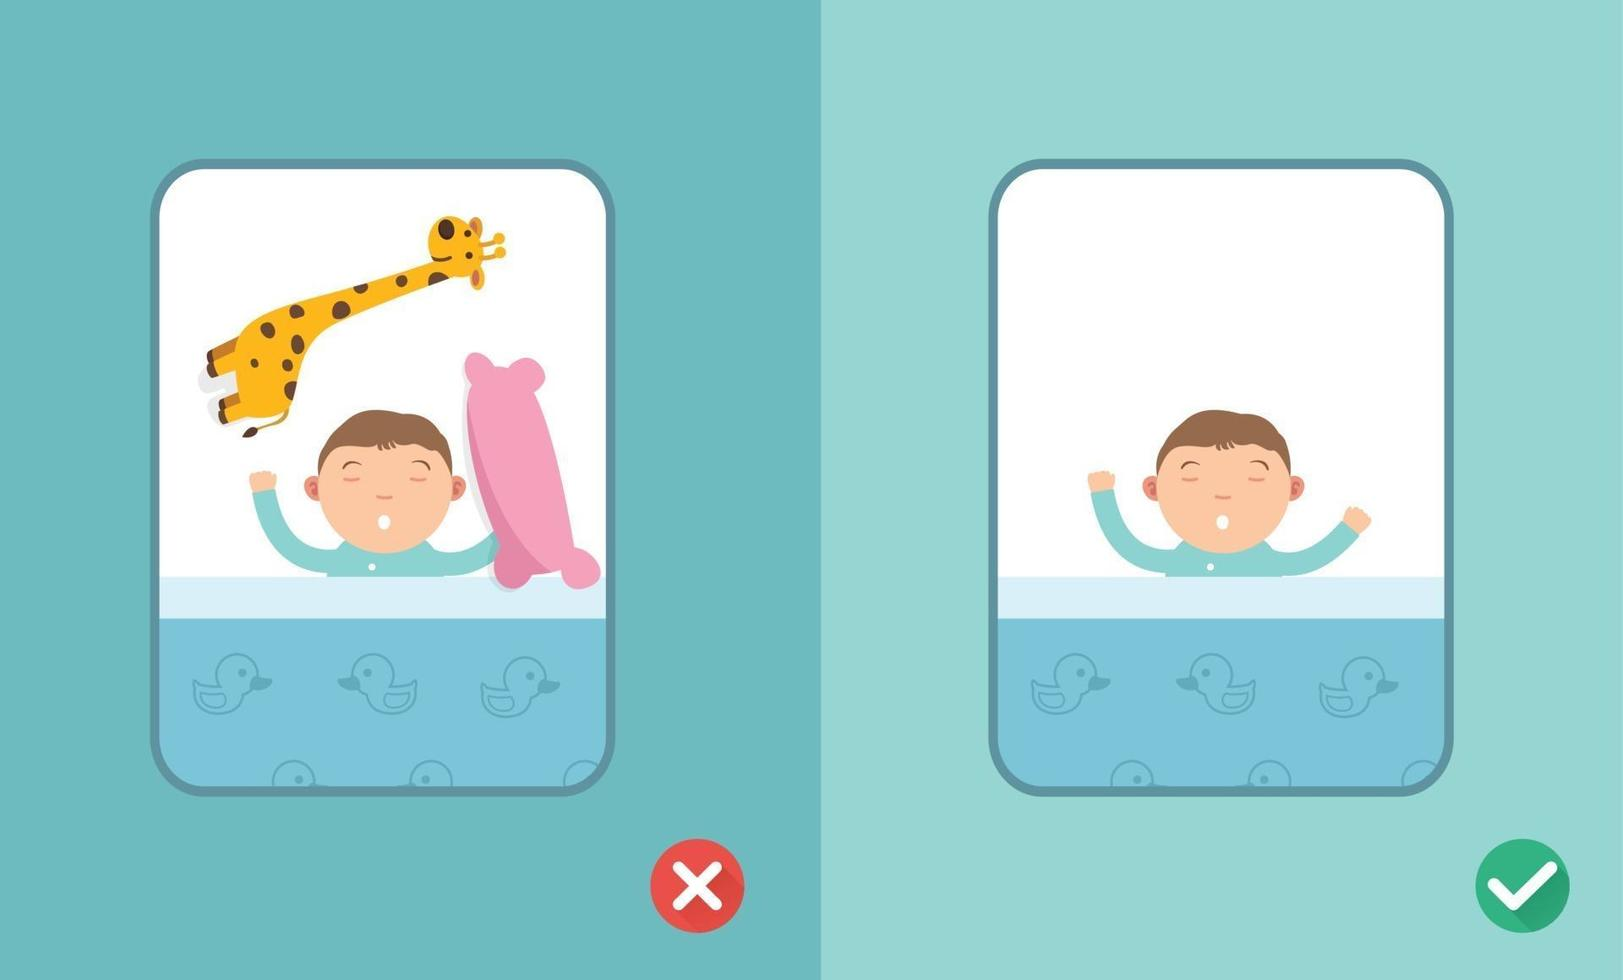 certo e errado bebê dormindo seguro, vetor